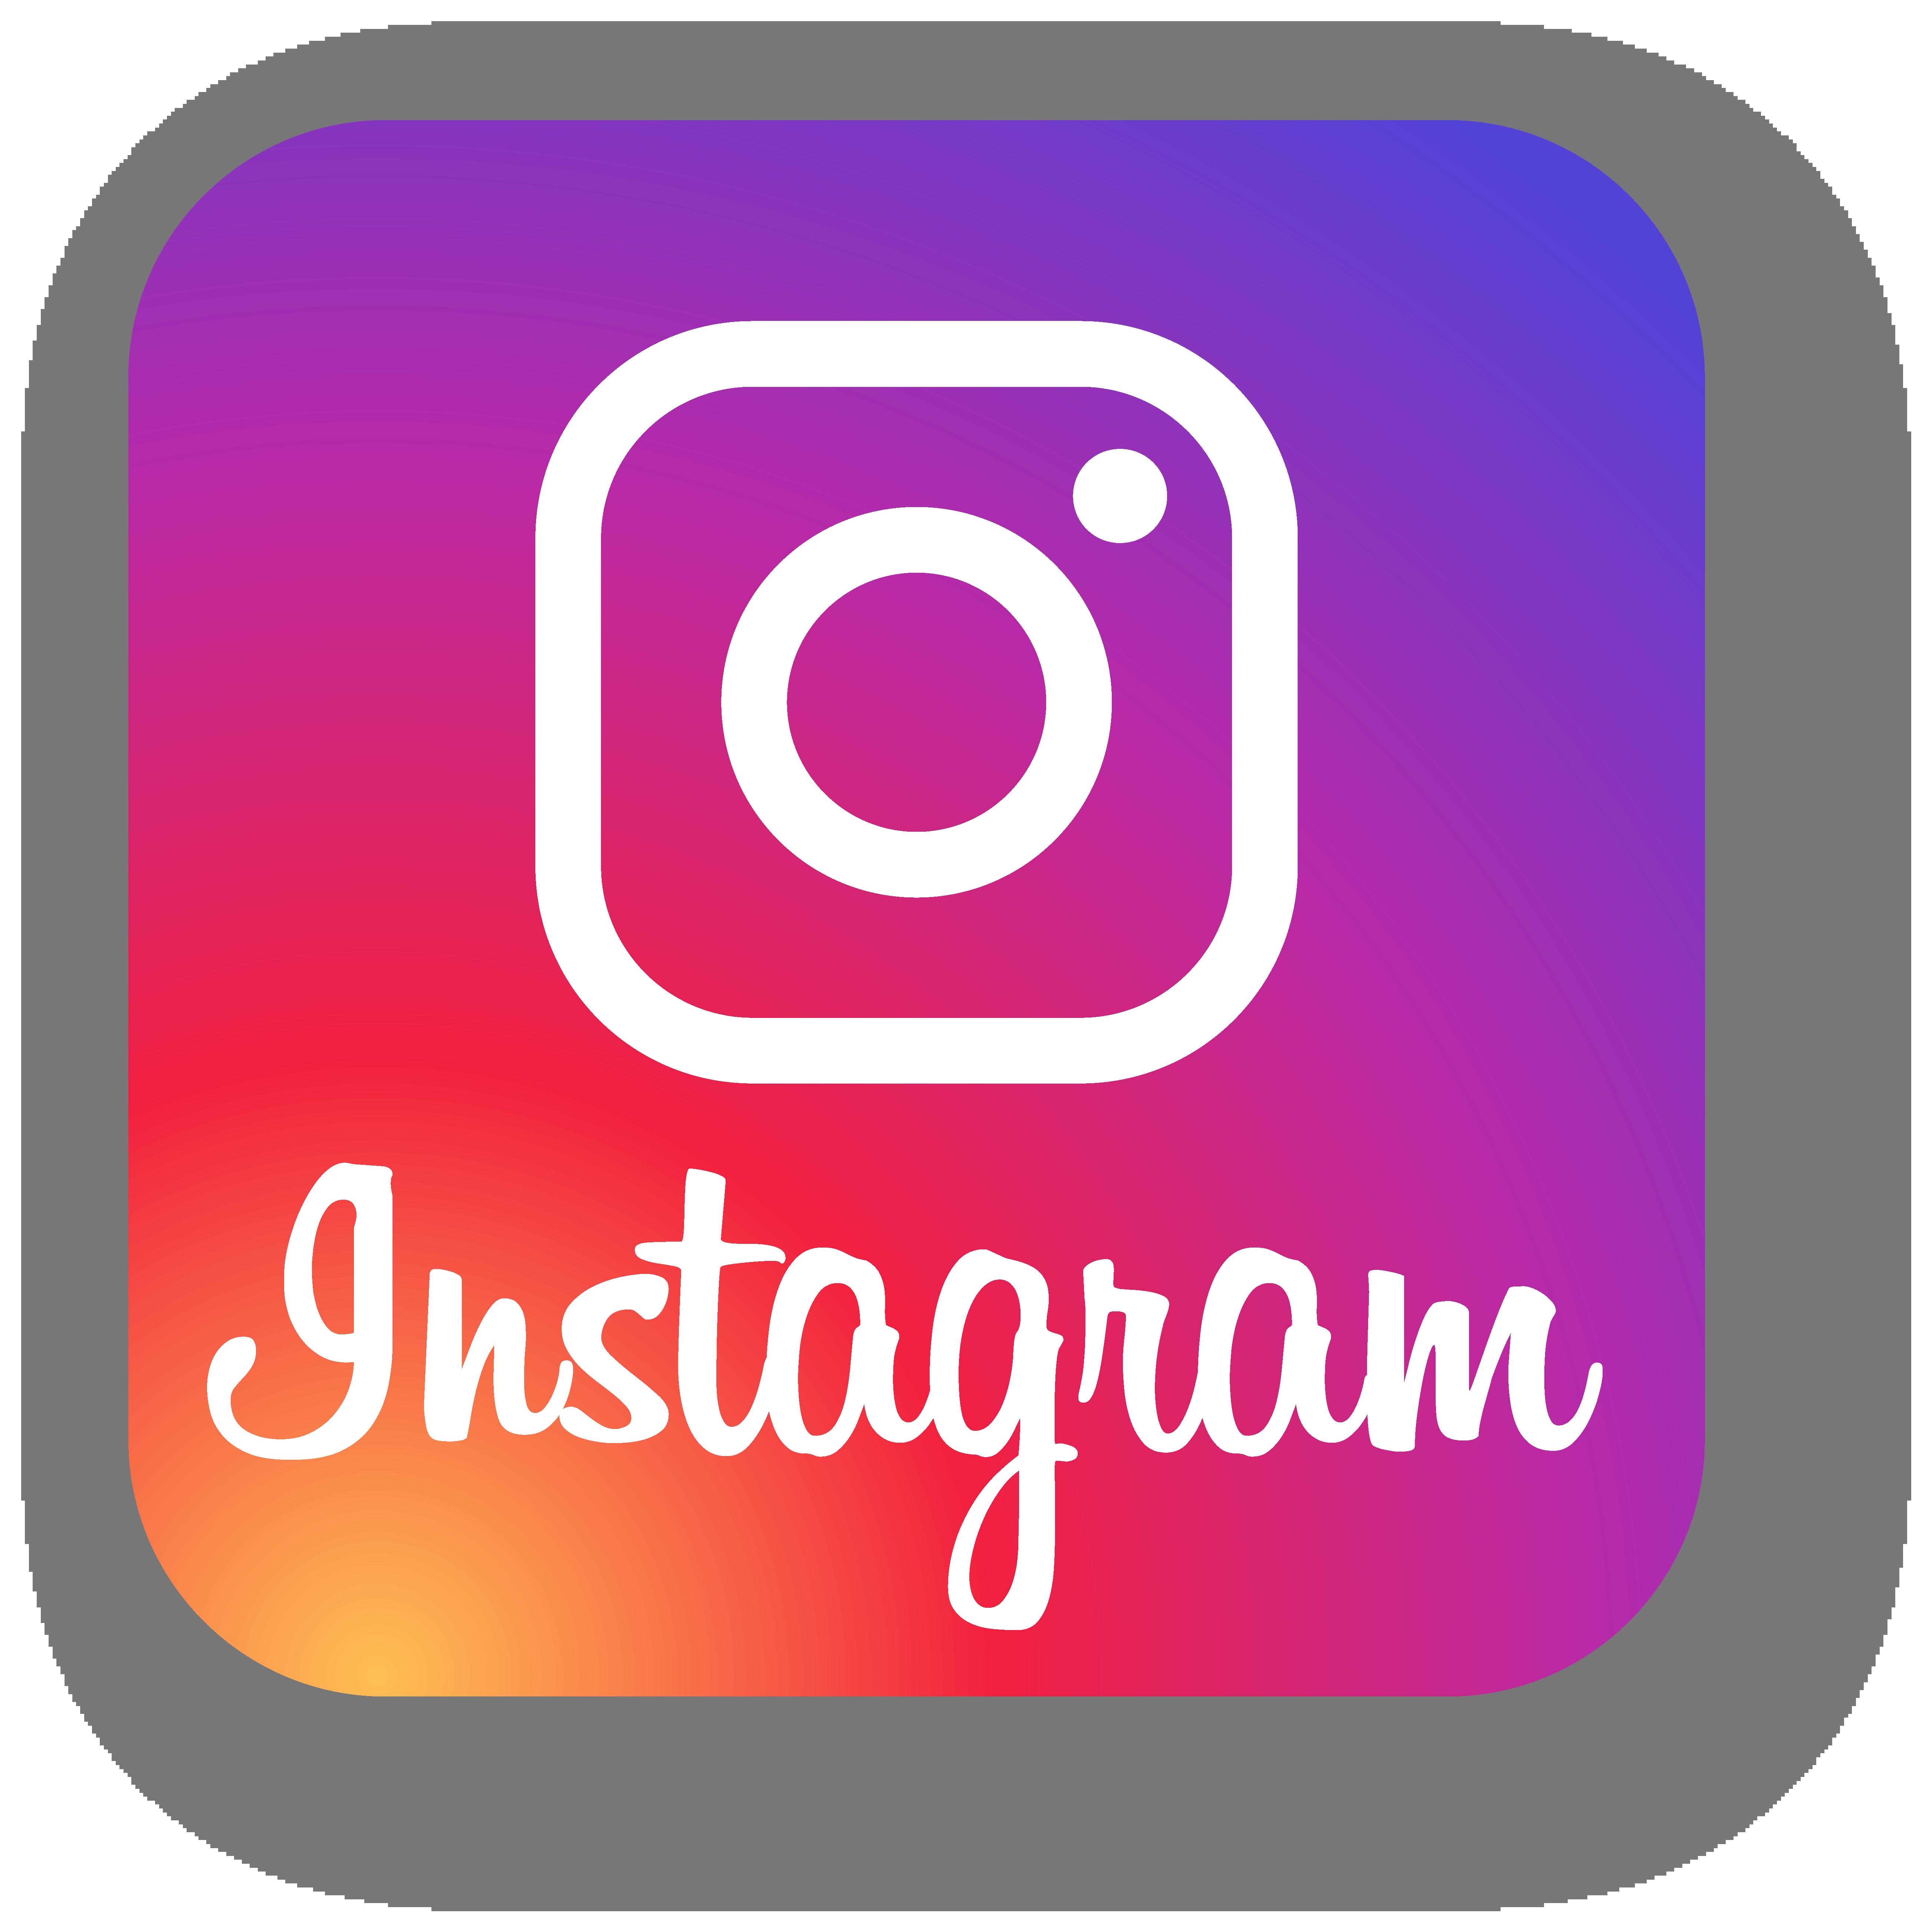 https://instagram.com/liwunipool?igshid=146chgew0pnqa